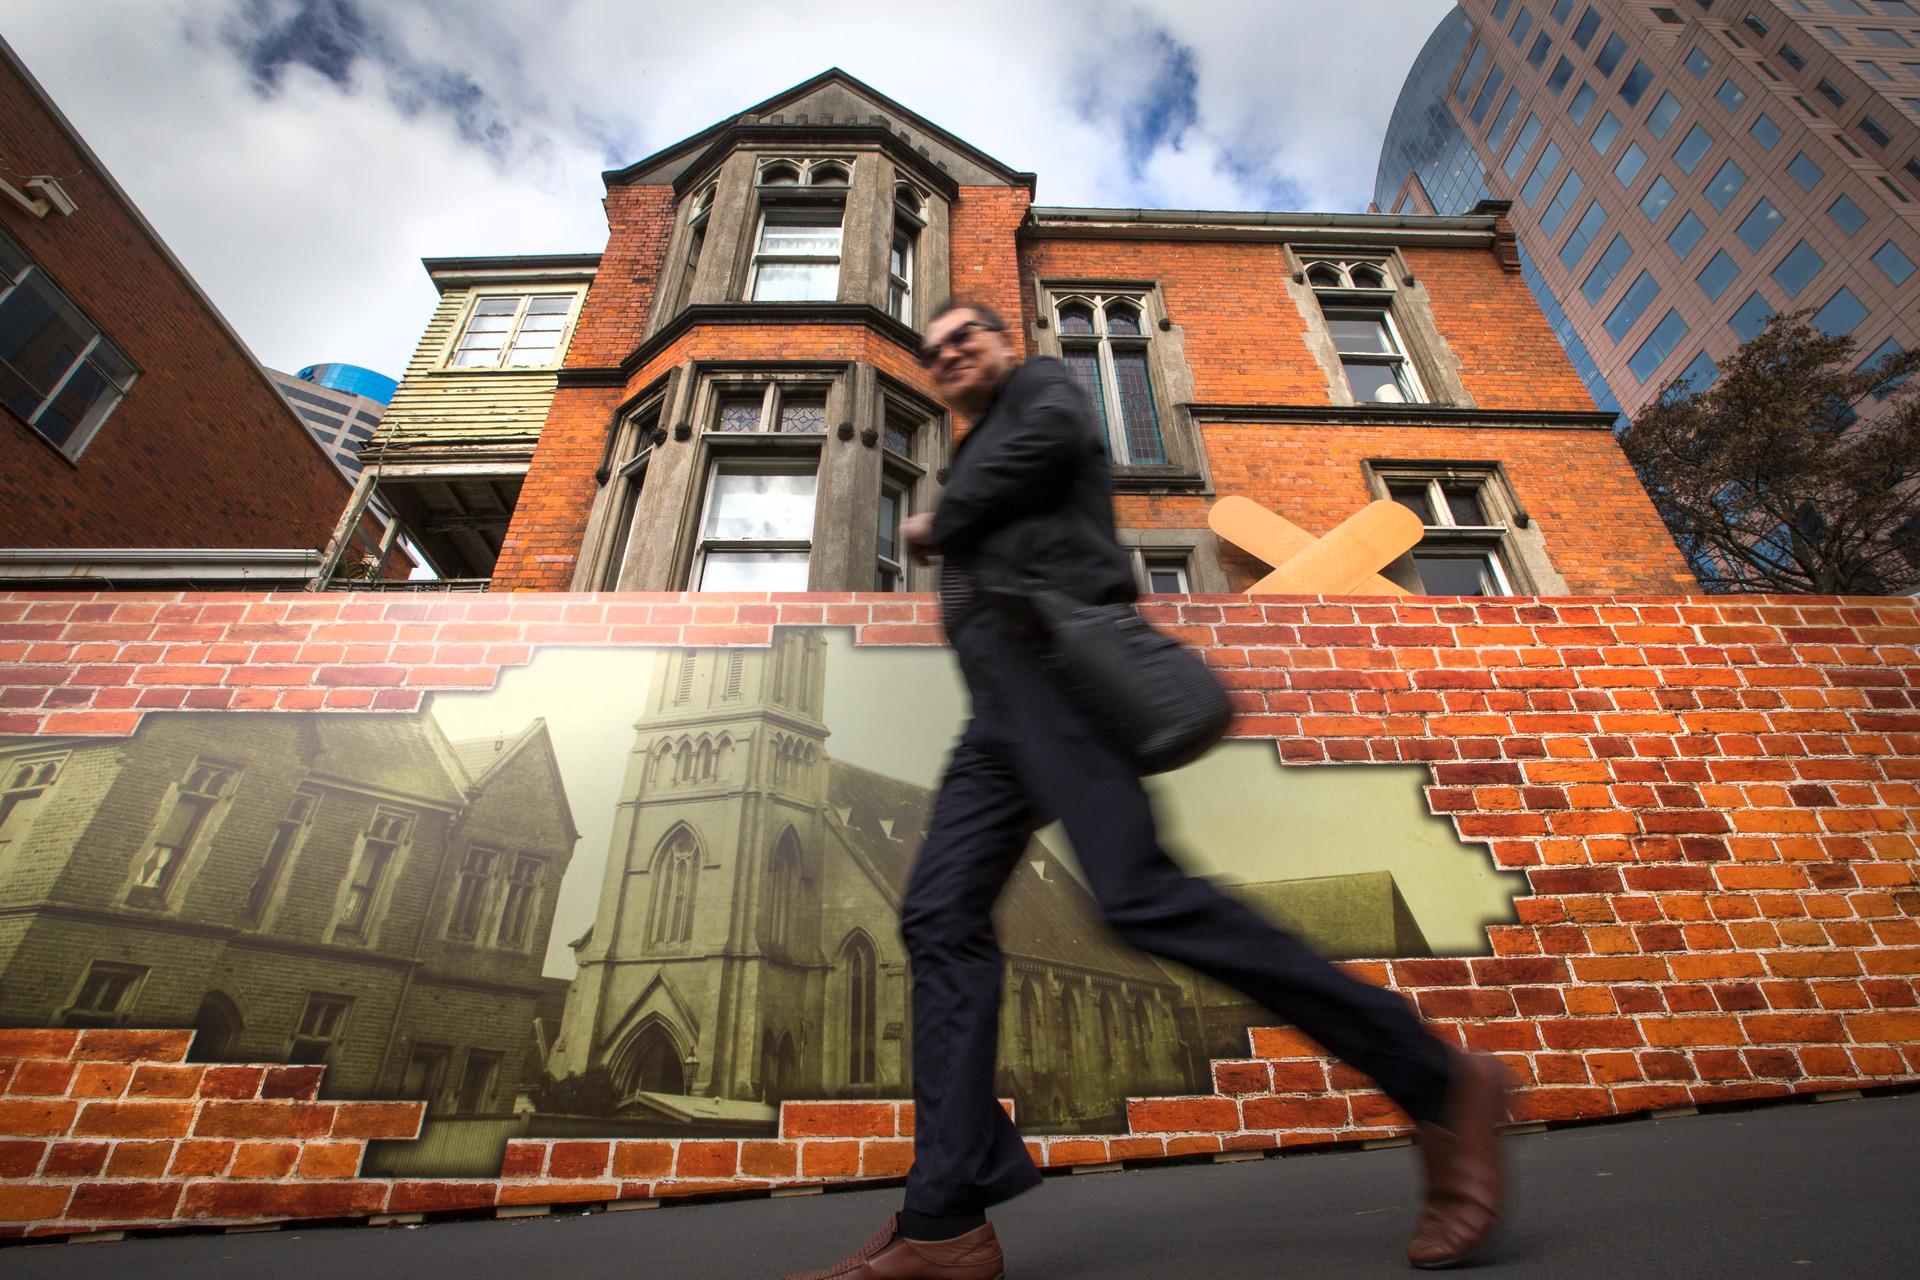 $3.8m job starts on precious 130-year-old inner-city Catholic residence